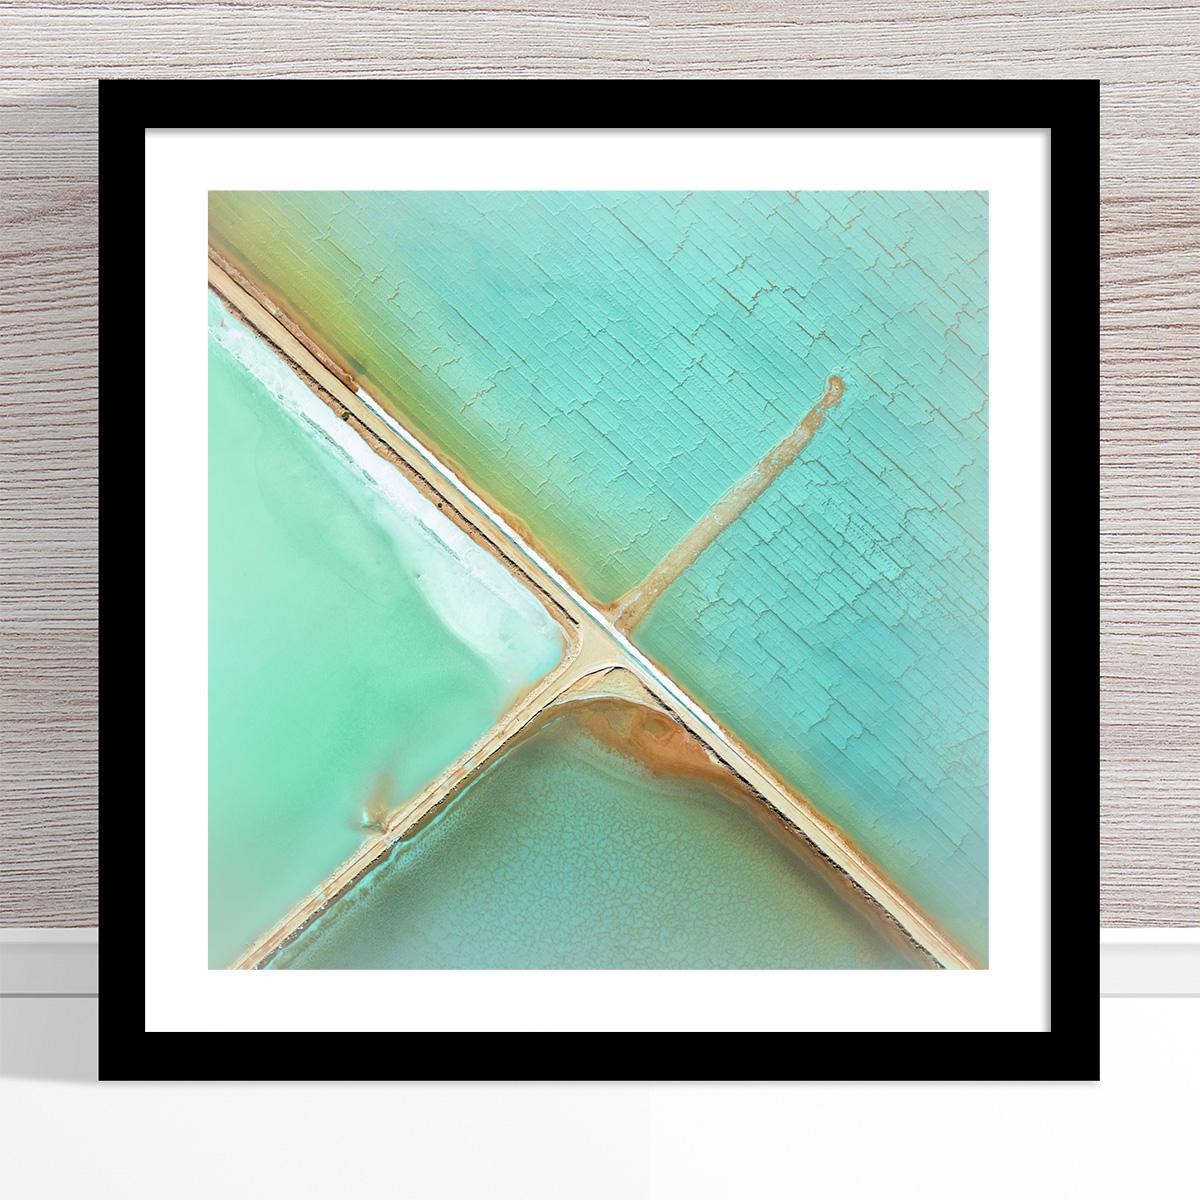 Chris Saunders - 'Aerial Salt 037' Black Frame